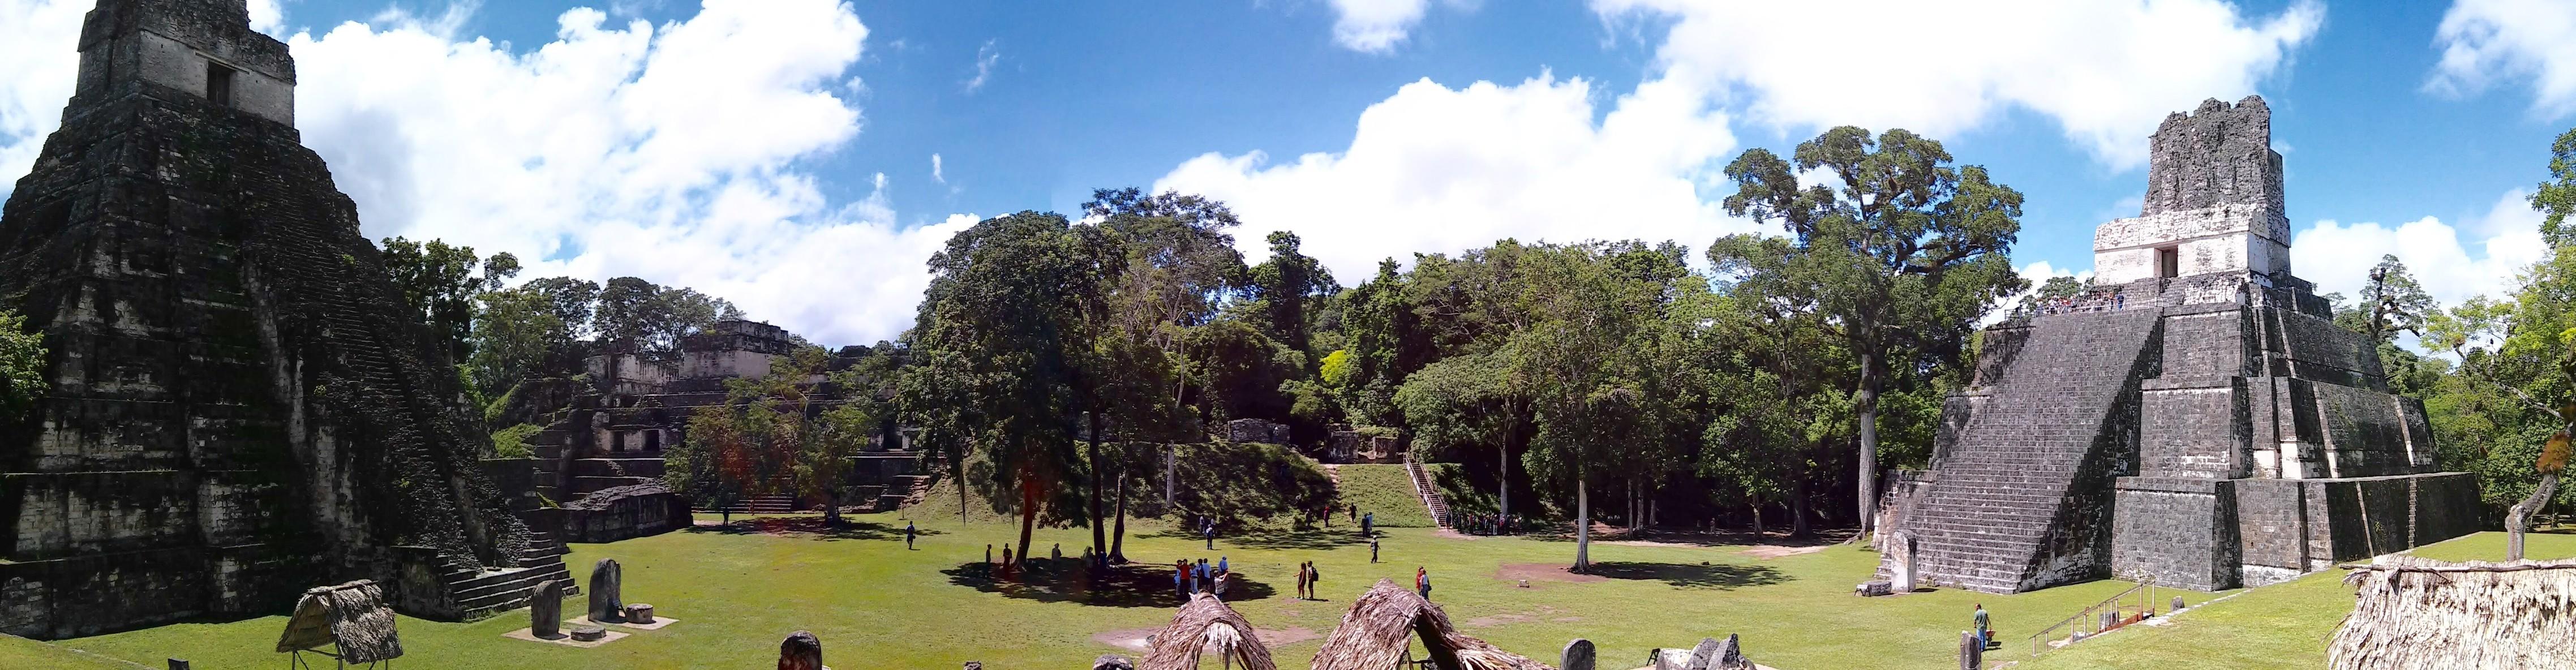 Un sueño cumplido: Tikal